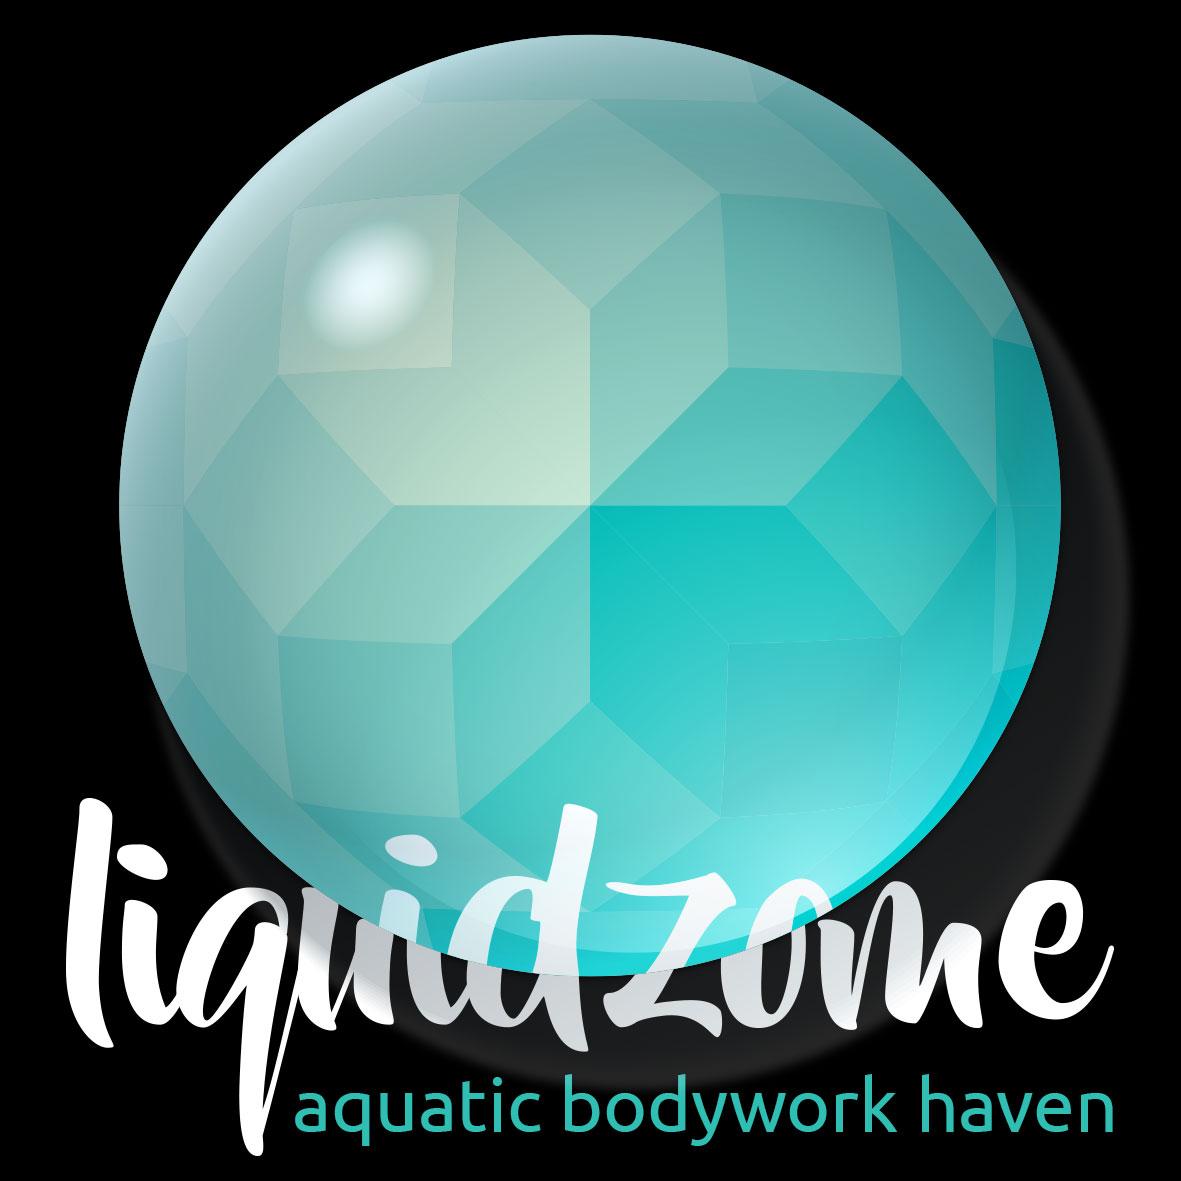 Liquidzome - Dream date